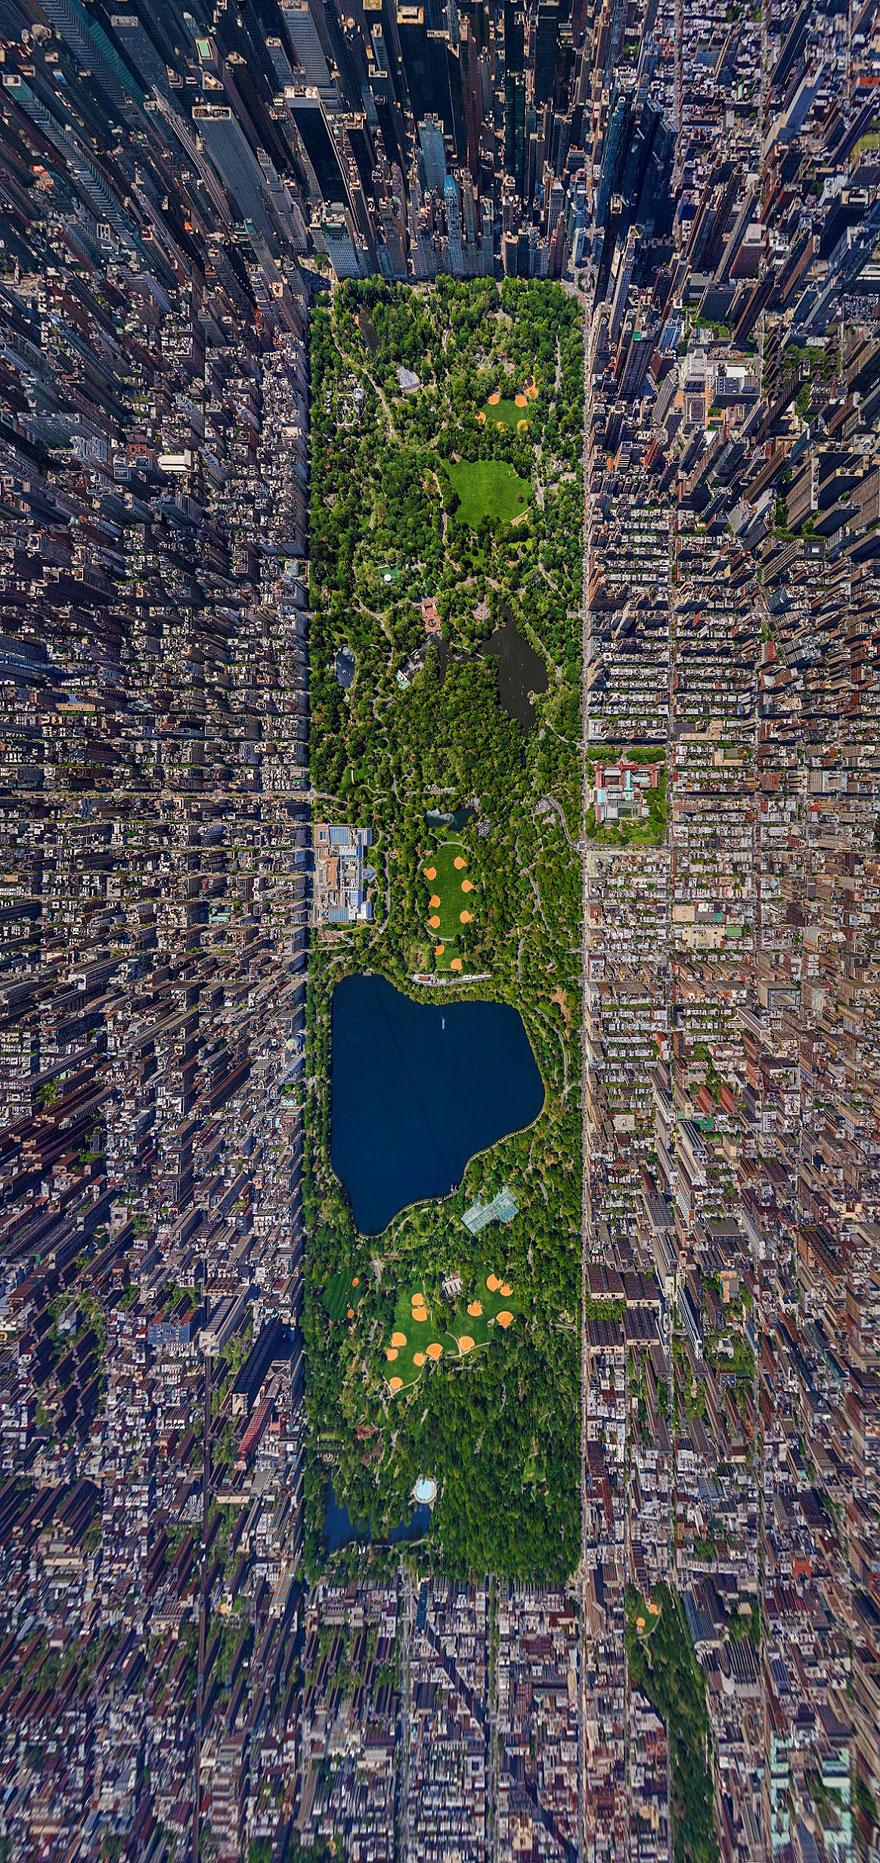 birds-eye-view-aerial-photography-2.jpg